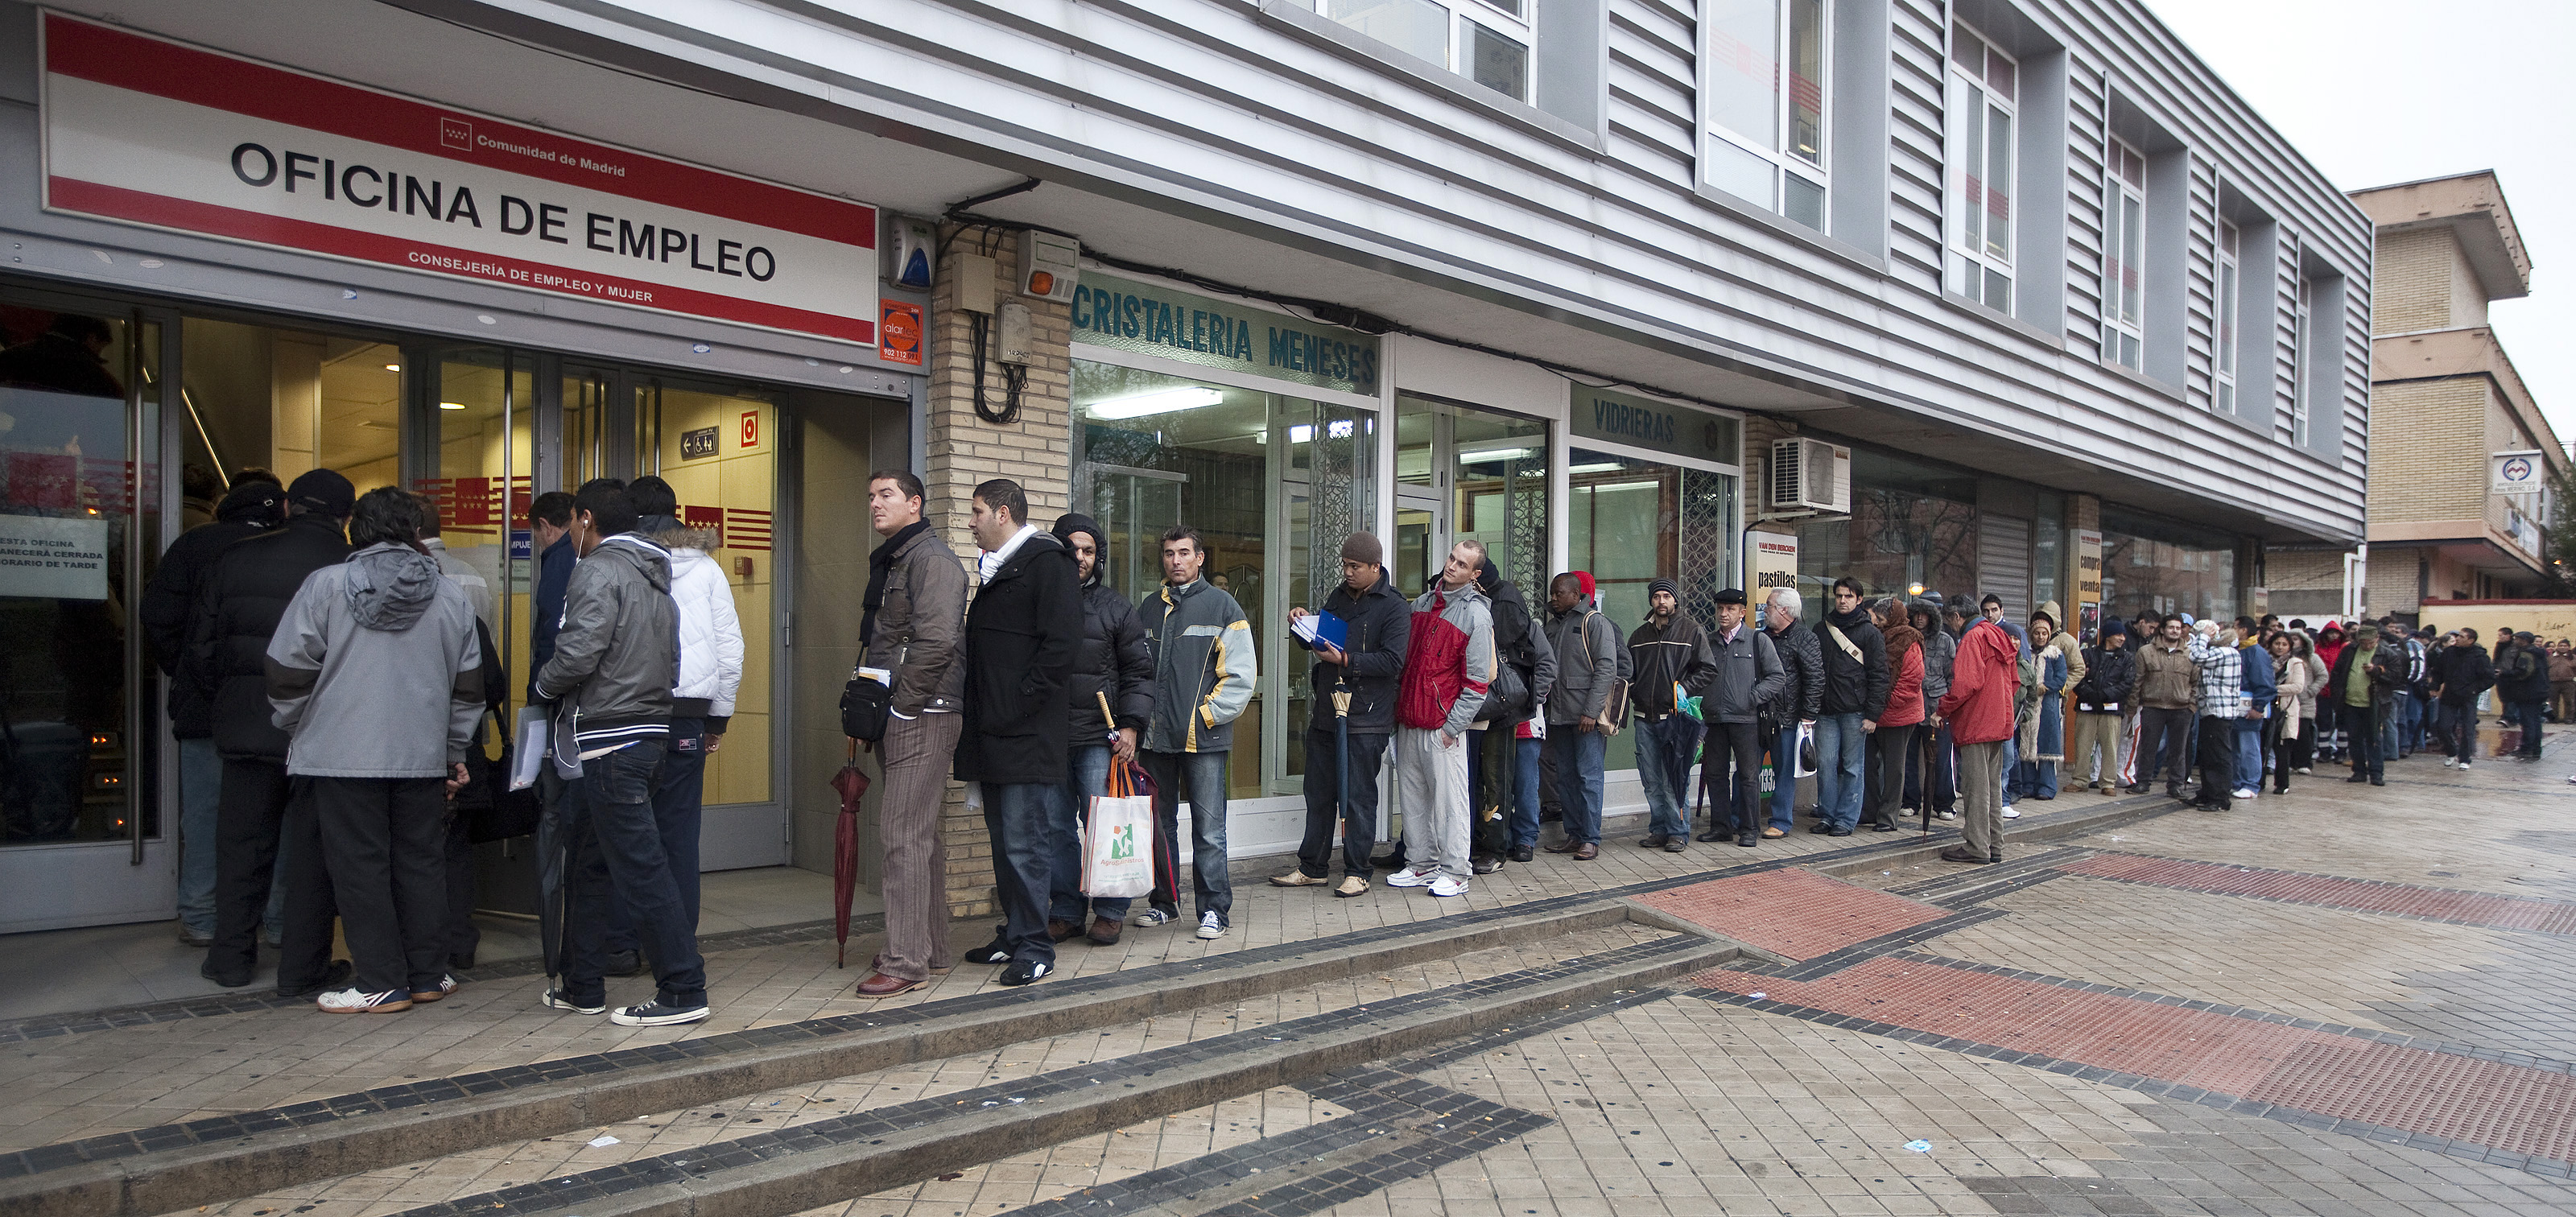 Espa a vuelve a liderar el desempleo en la uni n europea for Oficina de paro madrid